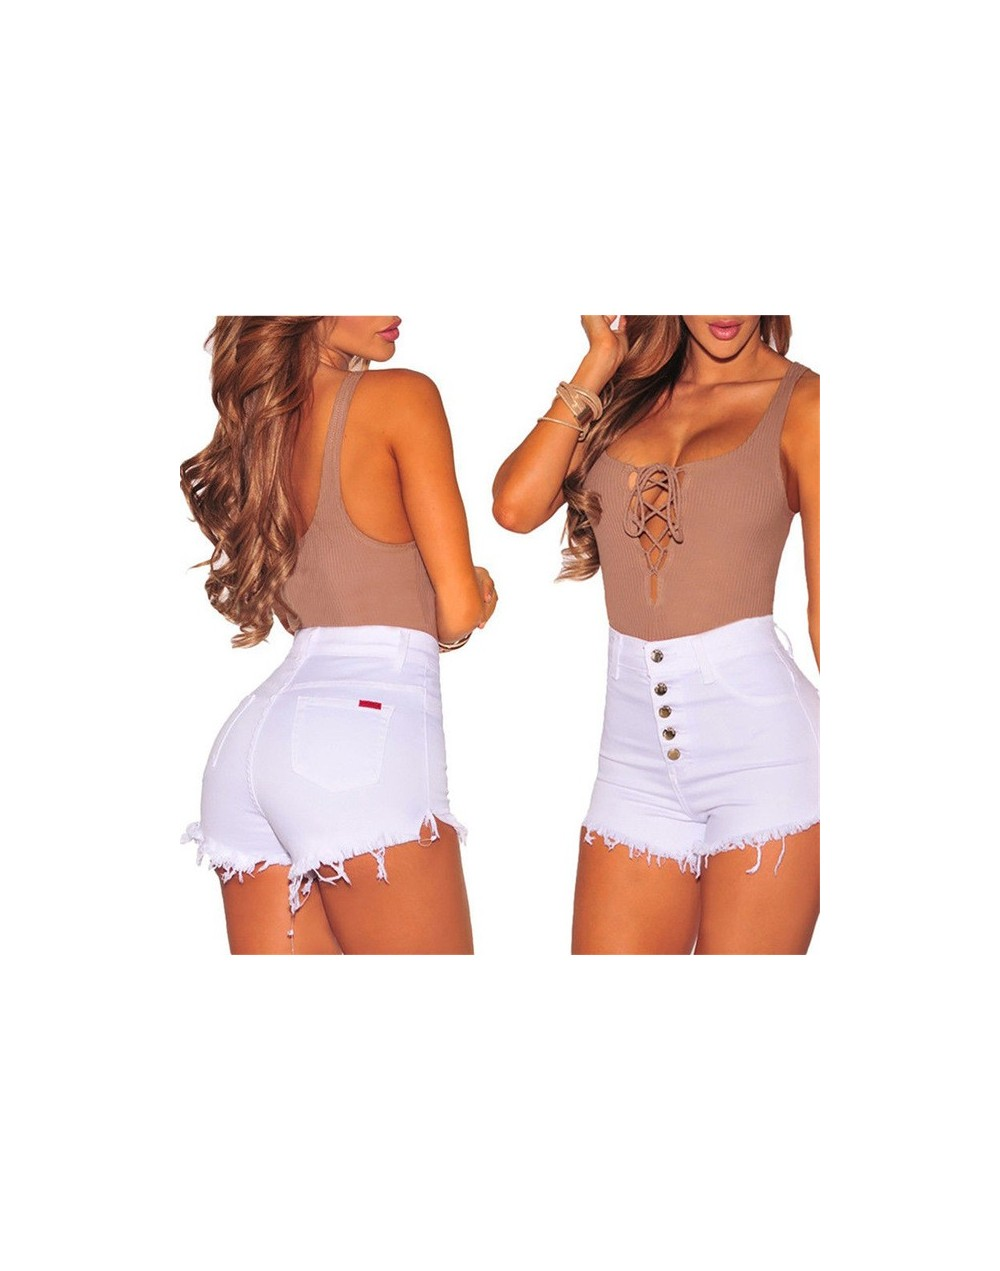 Hot Summer Women Casual High Waist Shorts 2019 Solid Mini Button Short Pants Black White Tassel Sexy Slim Shorts Woman Botto...